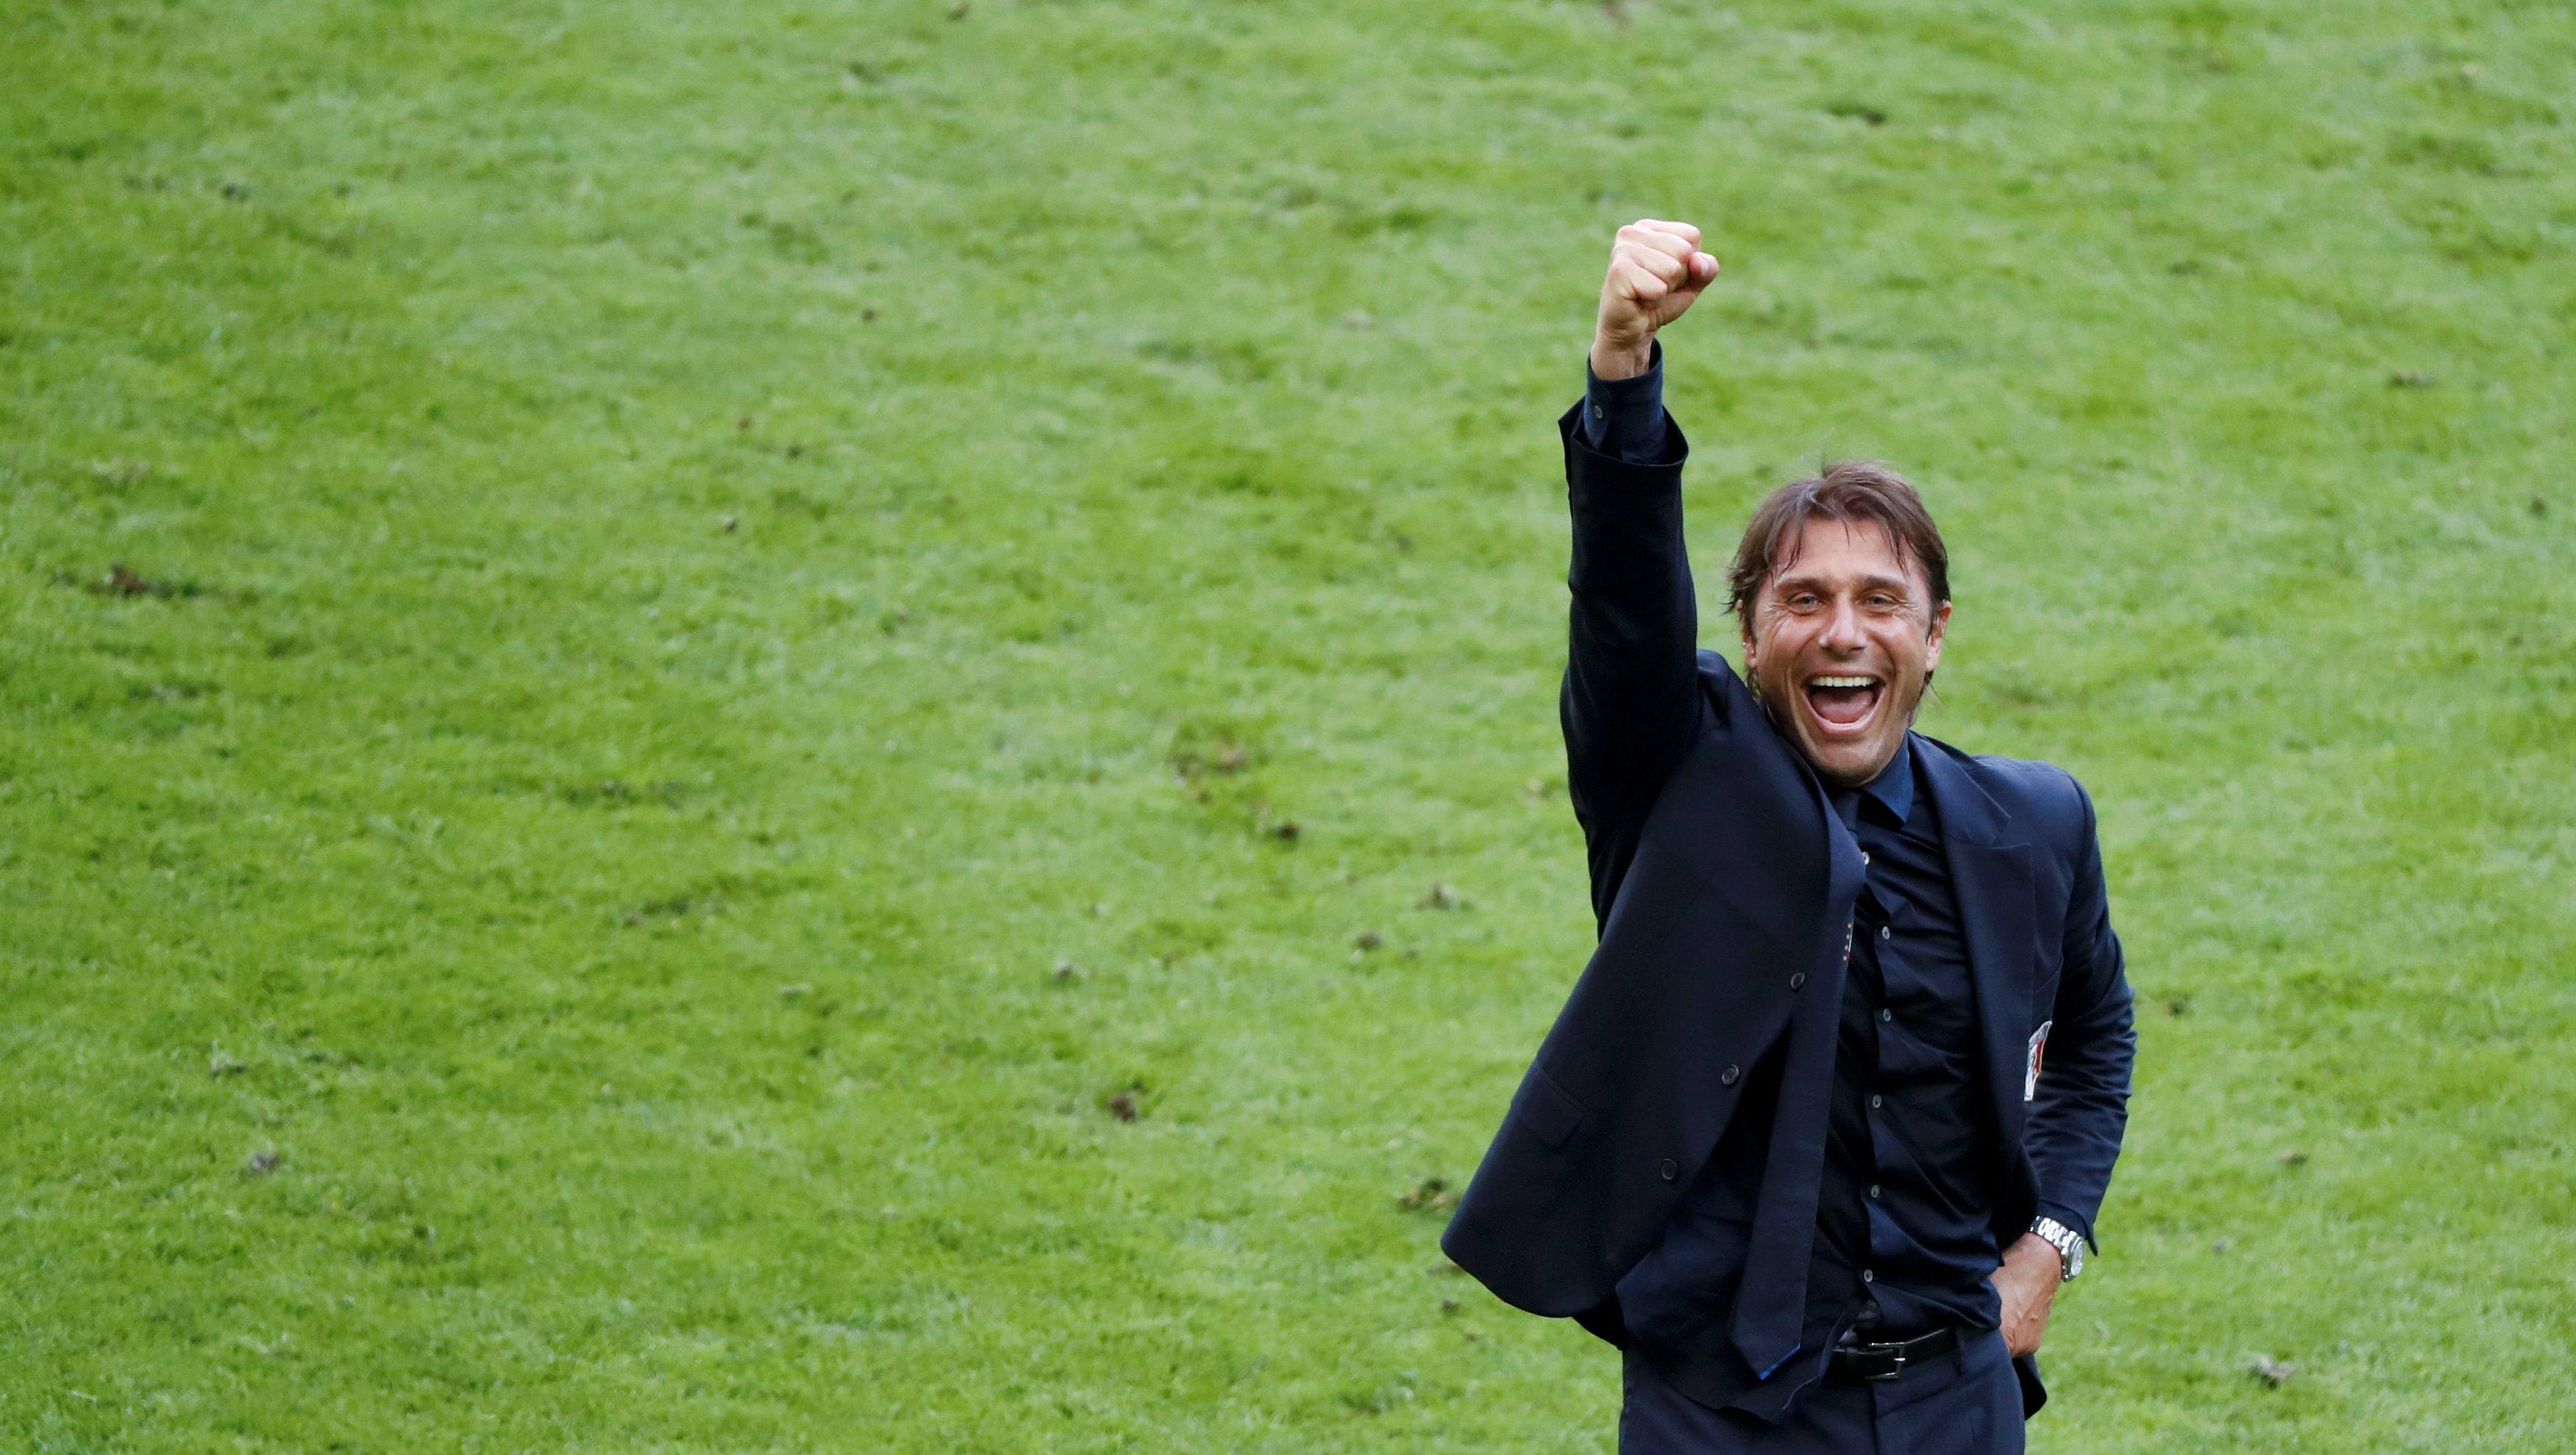 Antonio Conte has found success at Chelsea